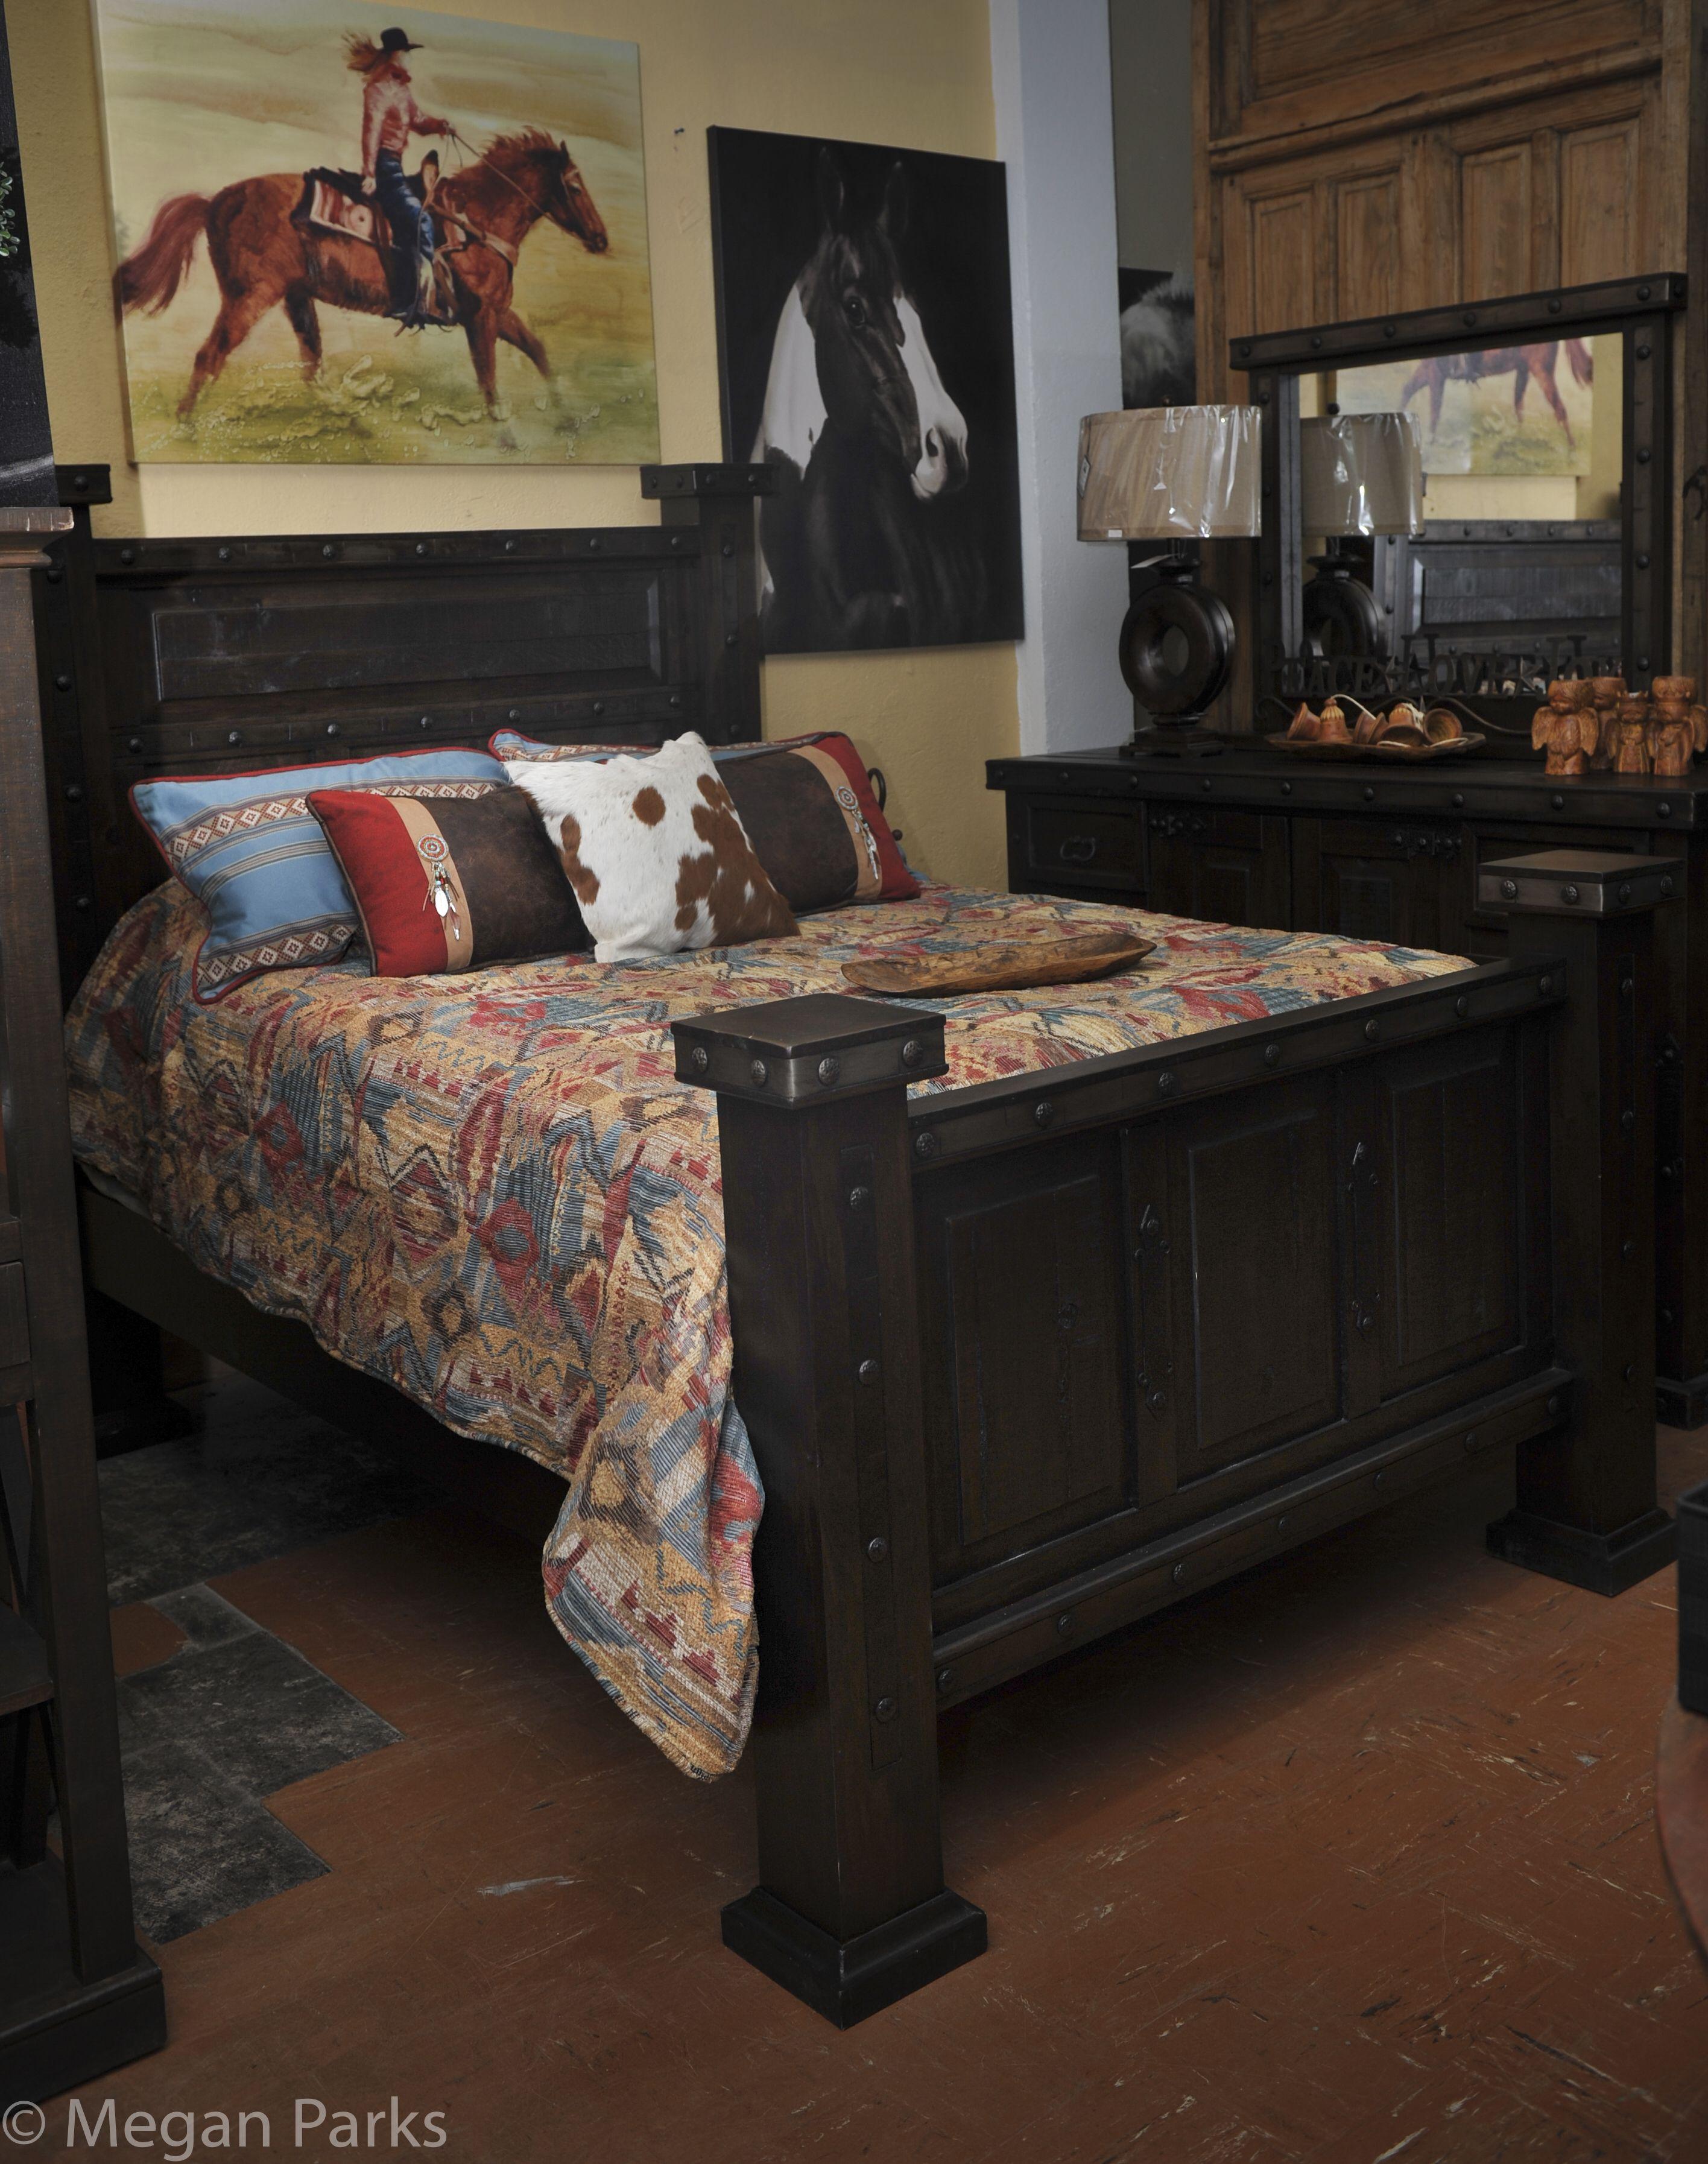 Santa Fe Terra offers a wide range of Western-style pieces ...